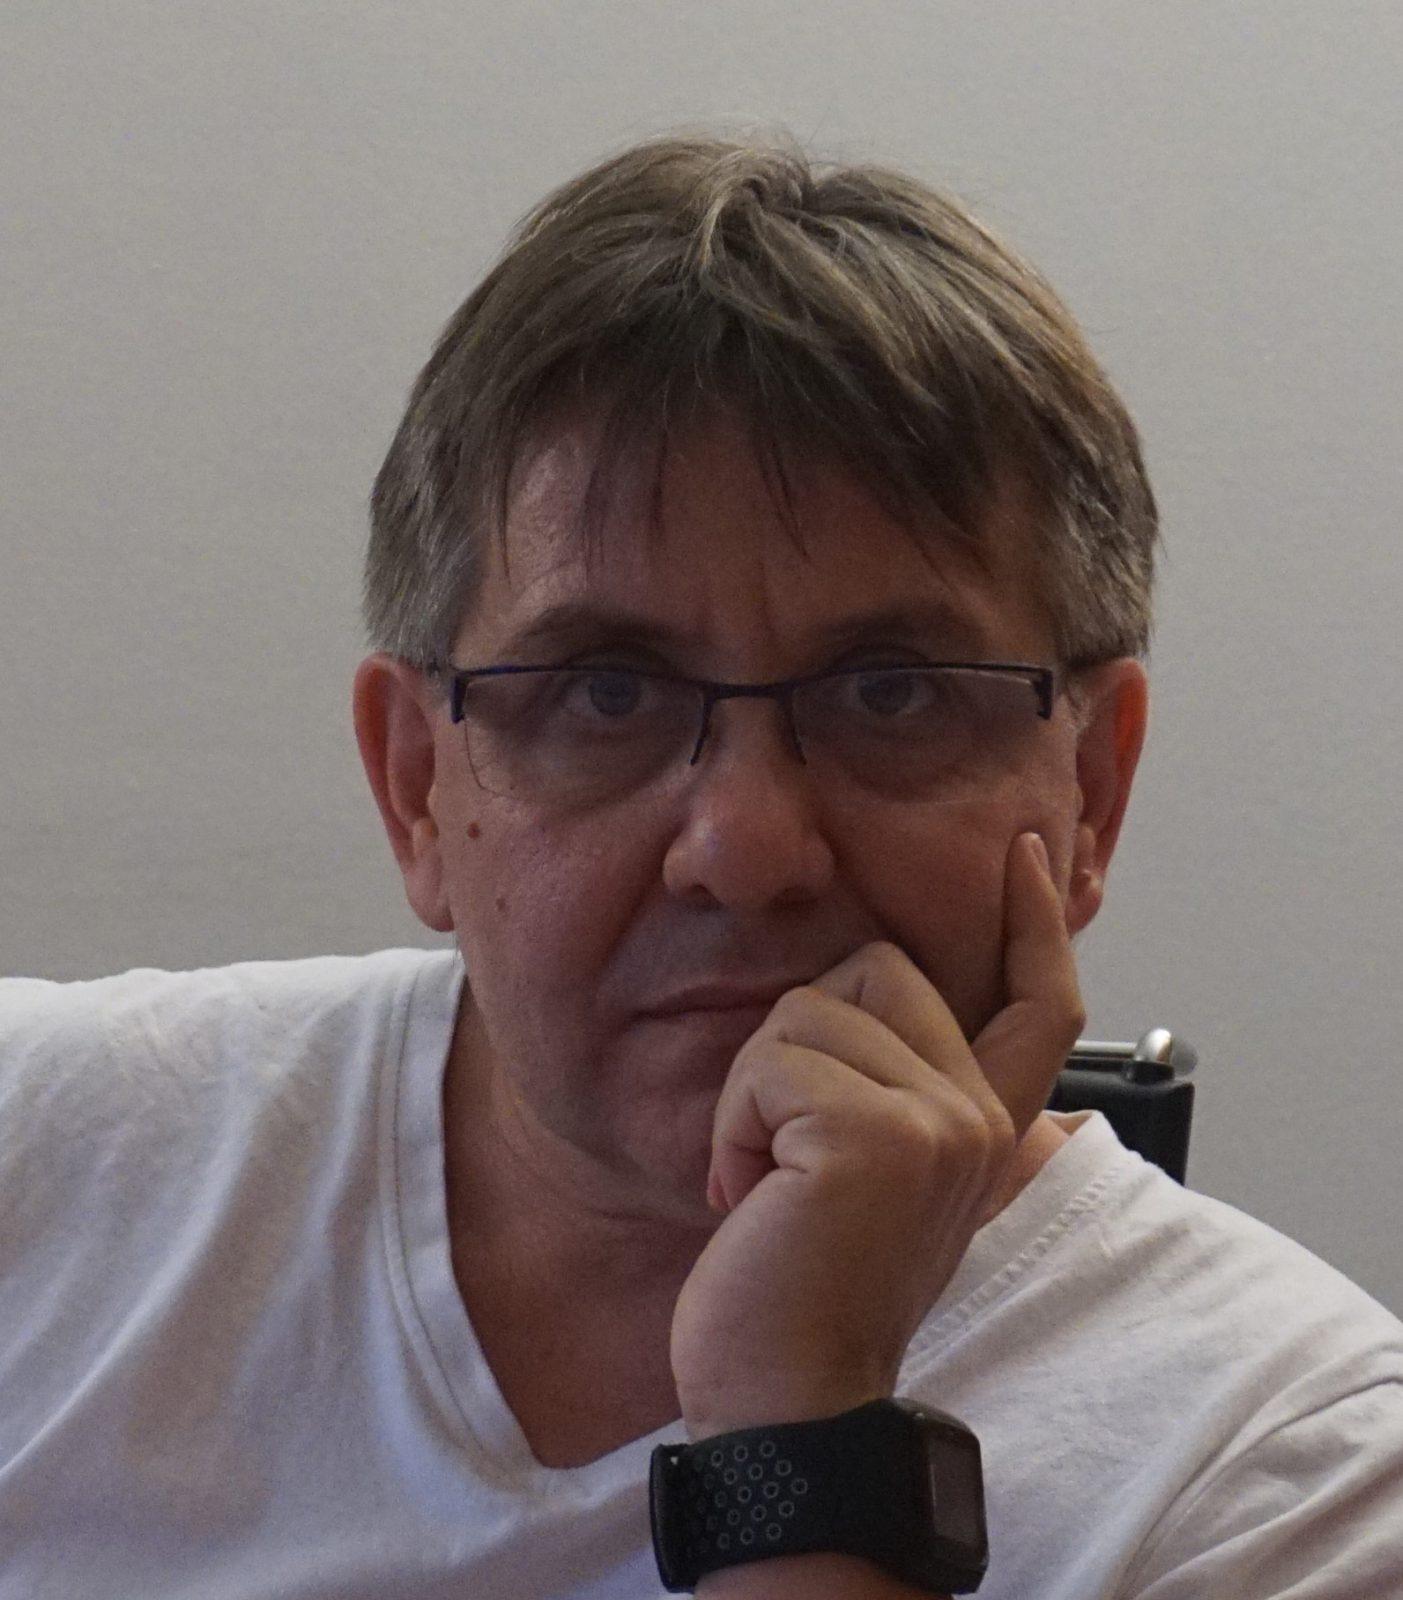 Jordi Ferrer-Juanola